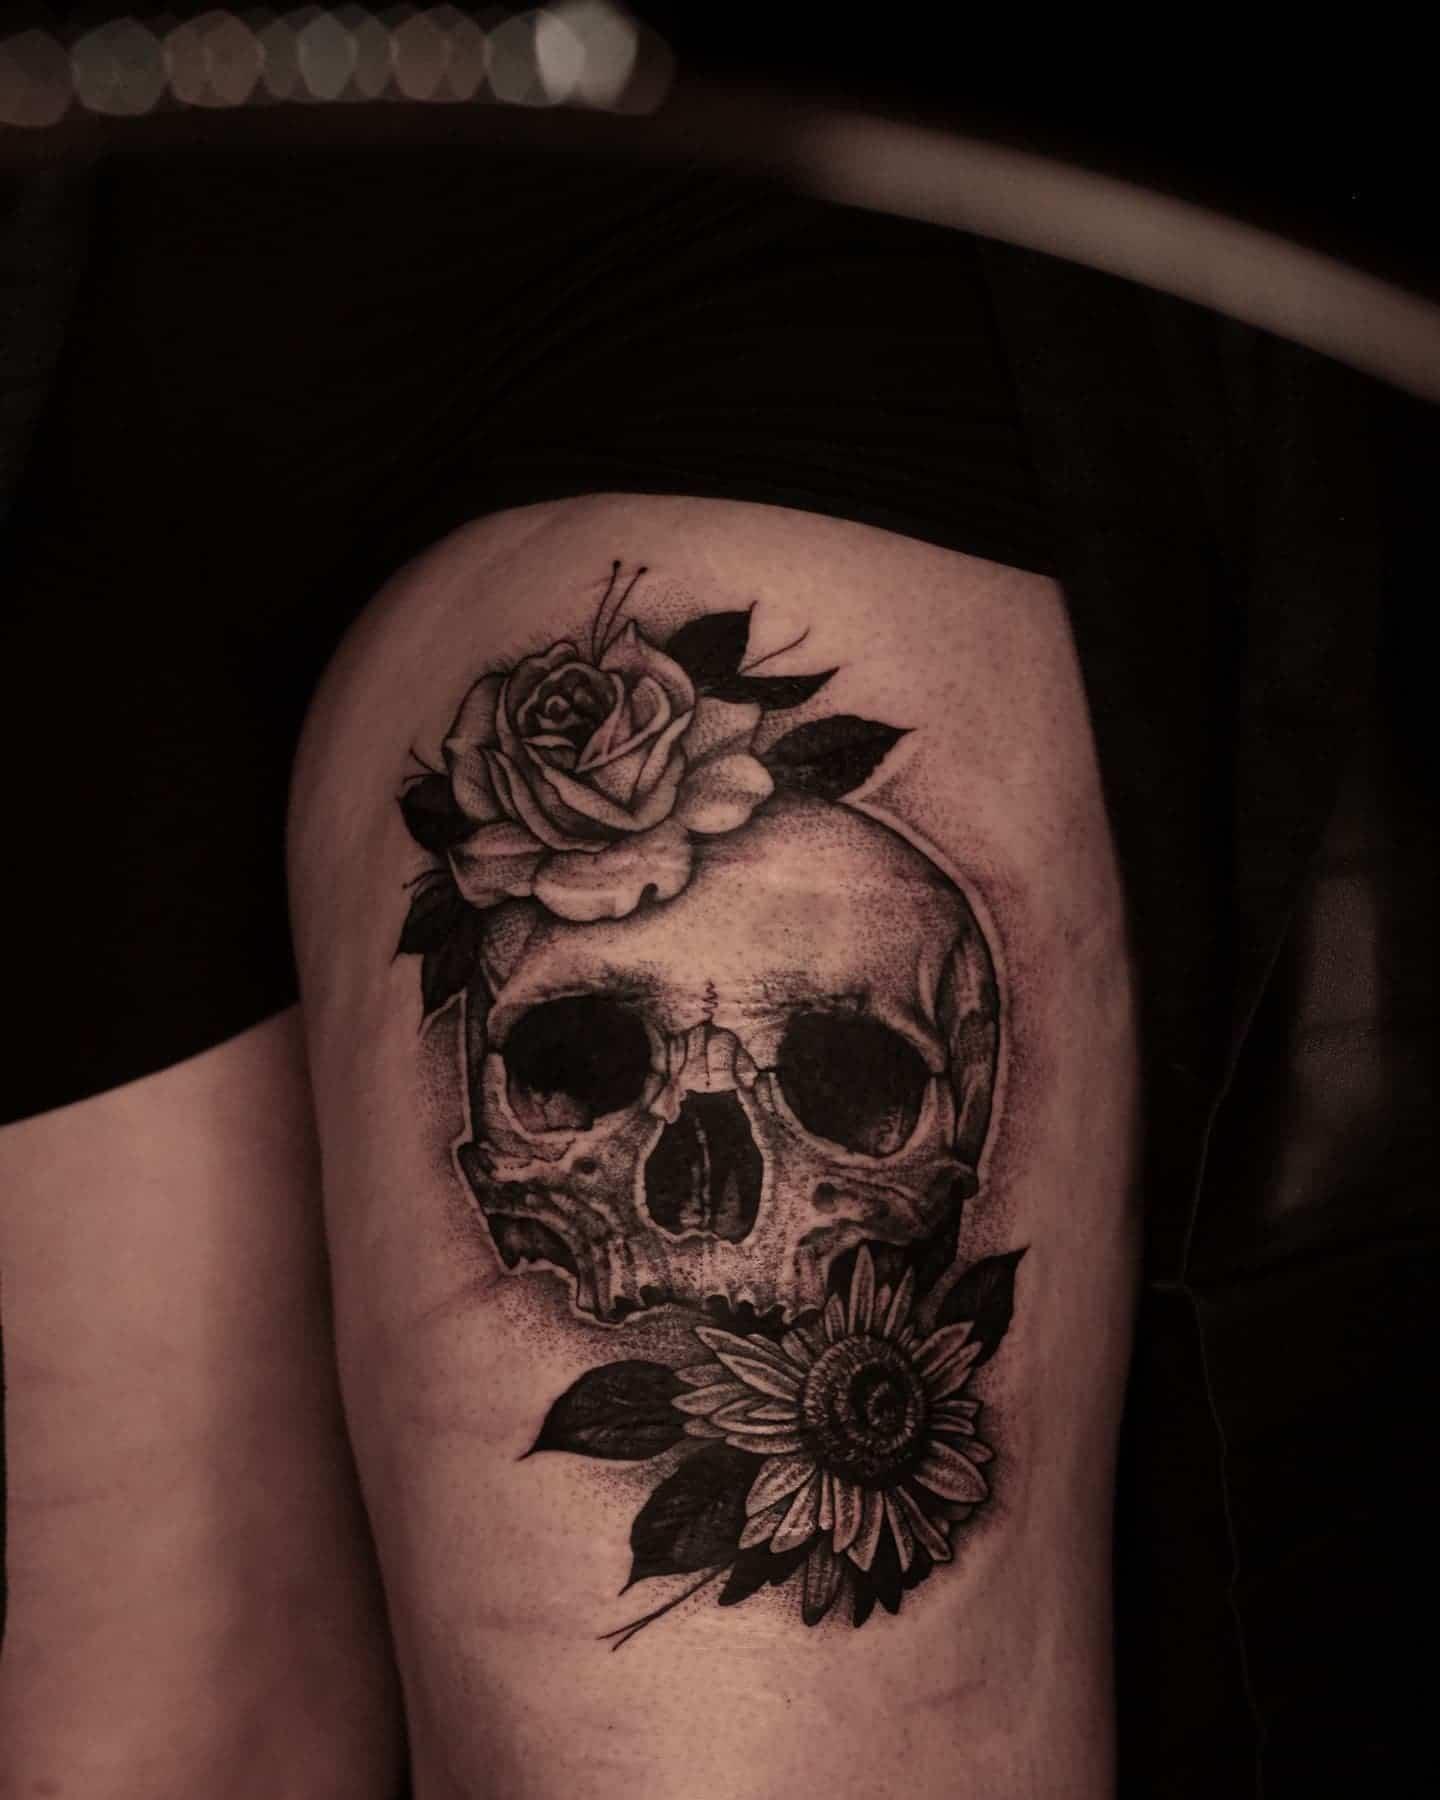 Skull and florals by Liz!  lizminellitattoo